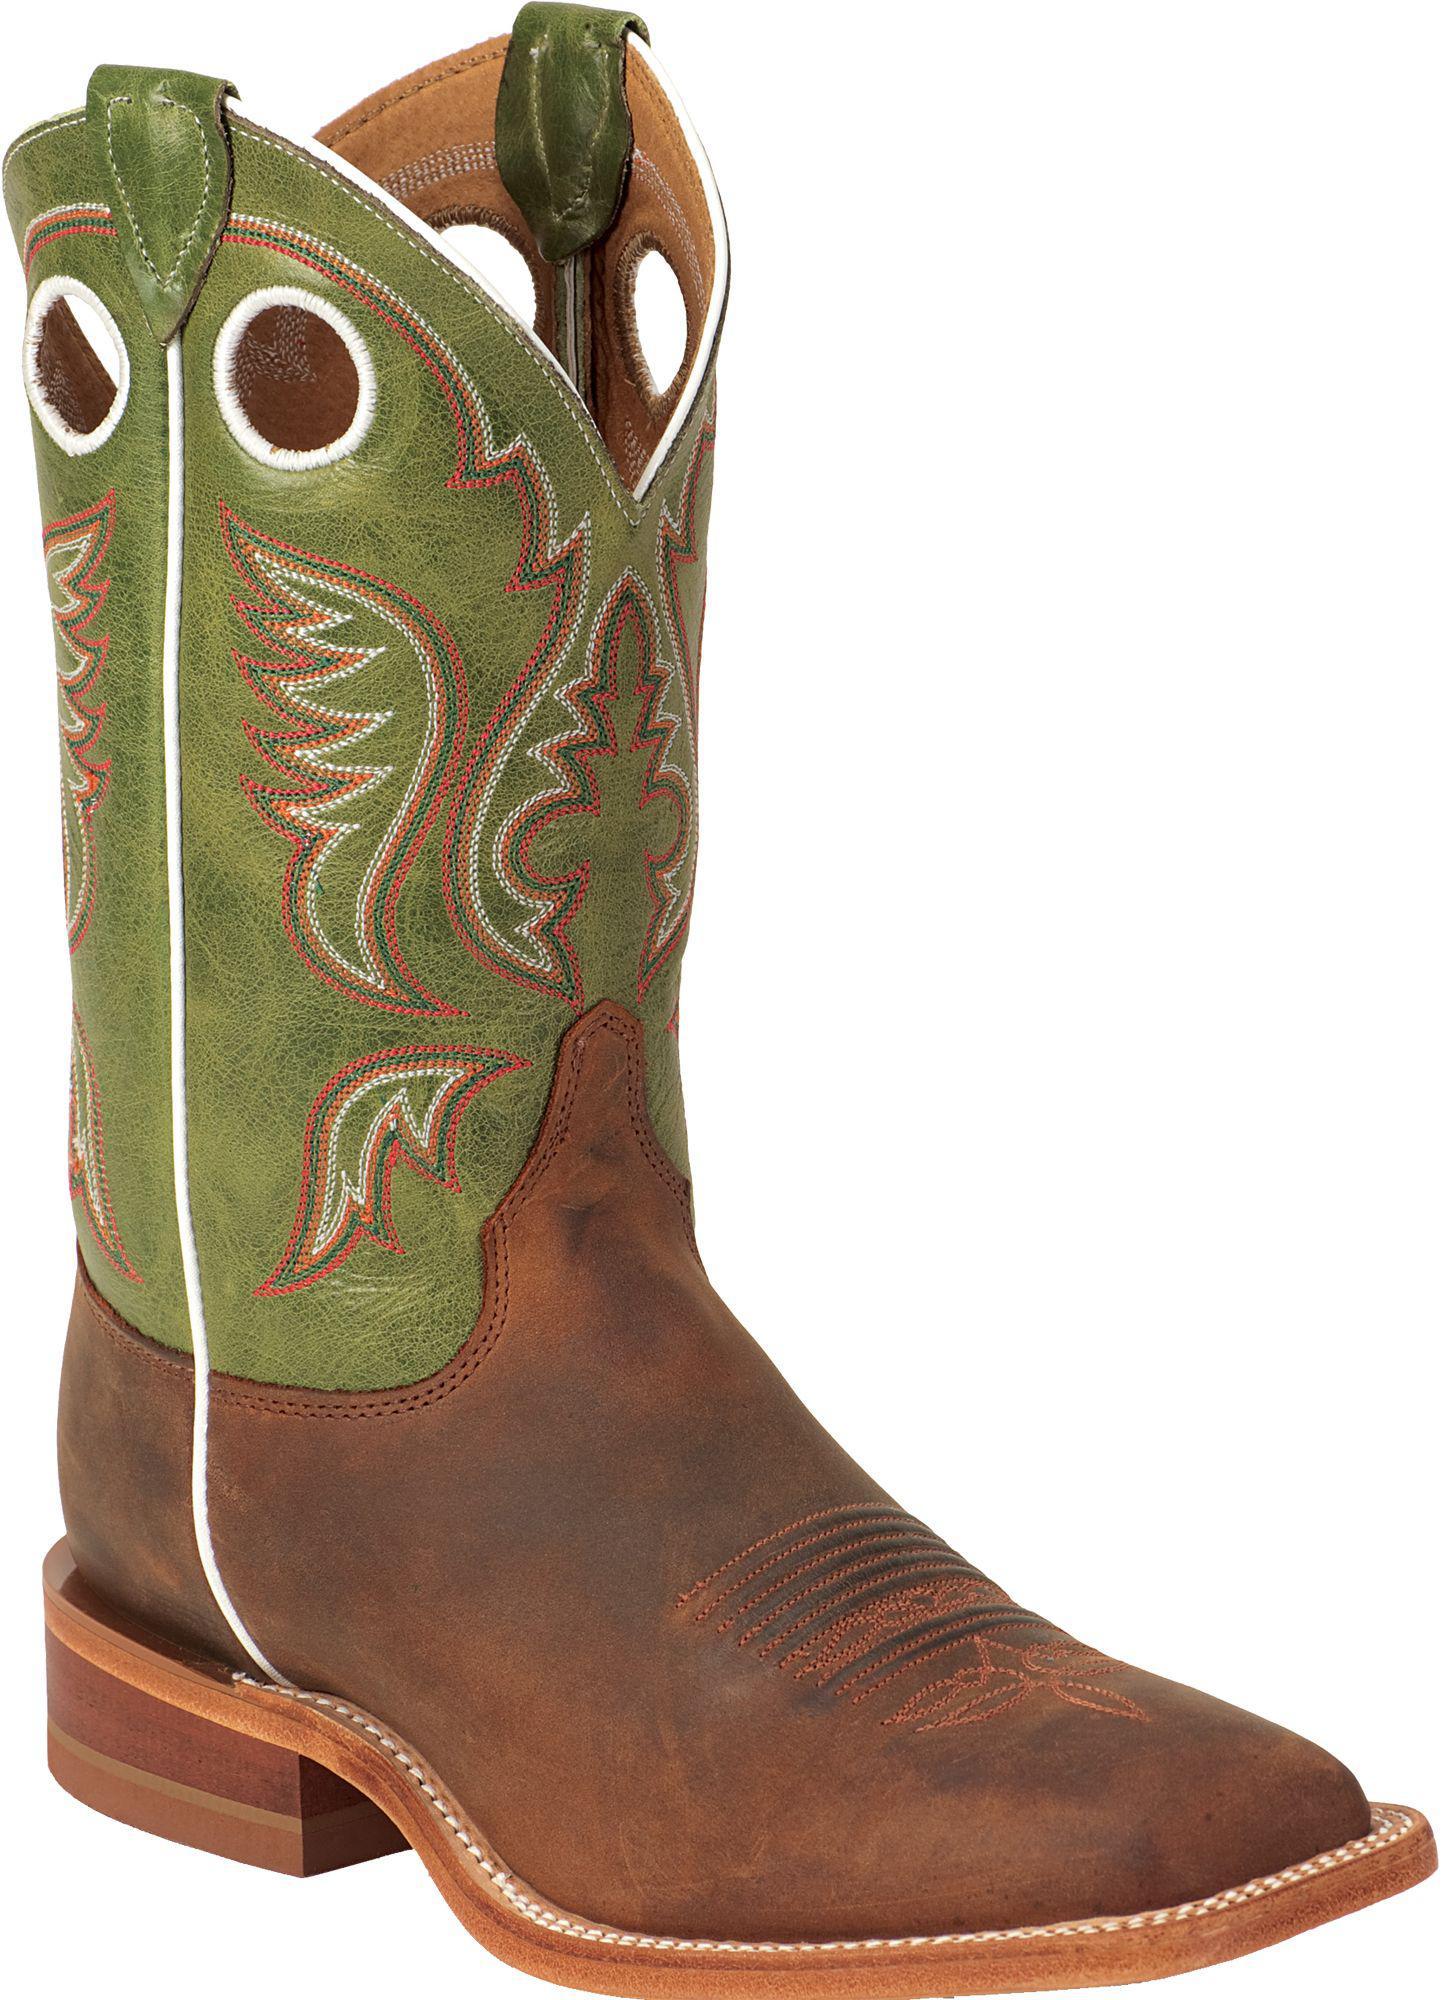 317cbd1462a Lyst - Justin Boots Justin Cognac Bent Rail Square Toe Western Boots ...